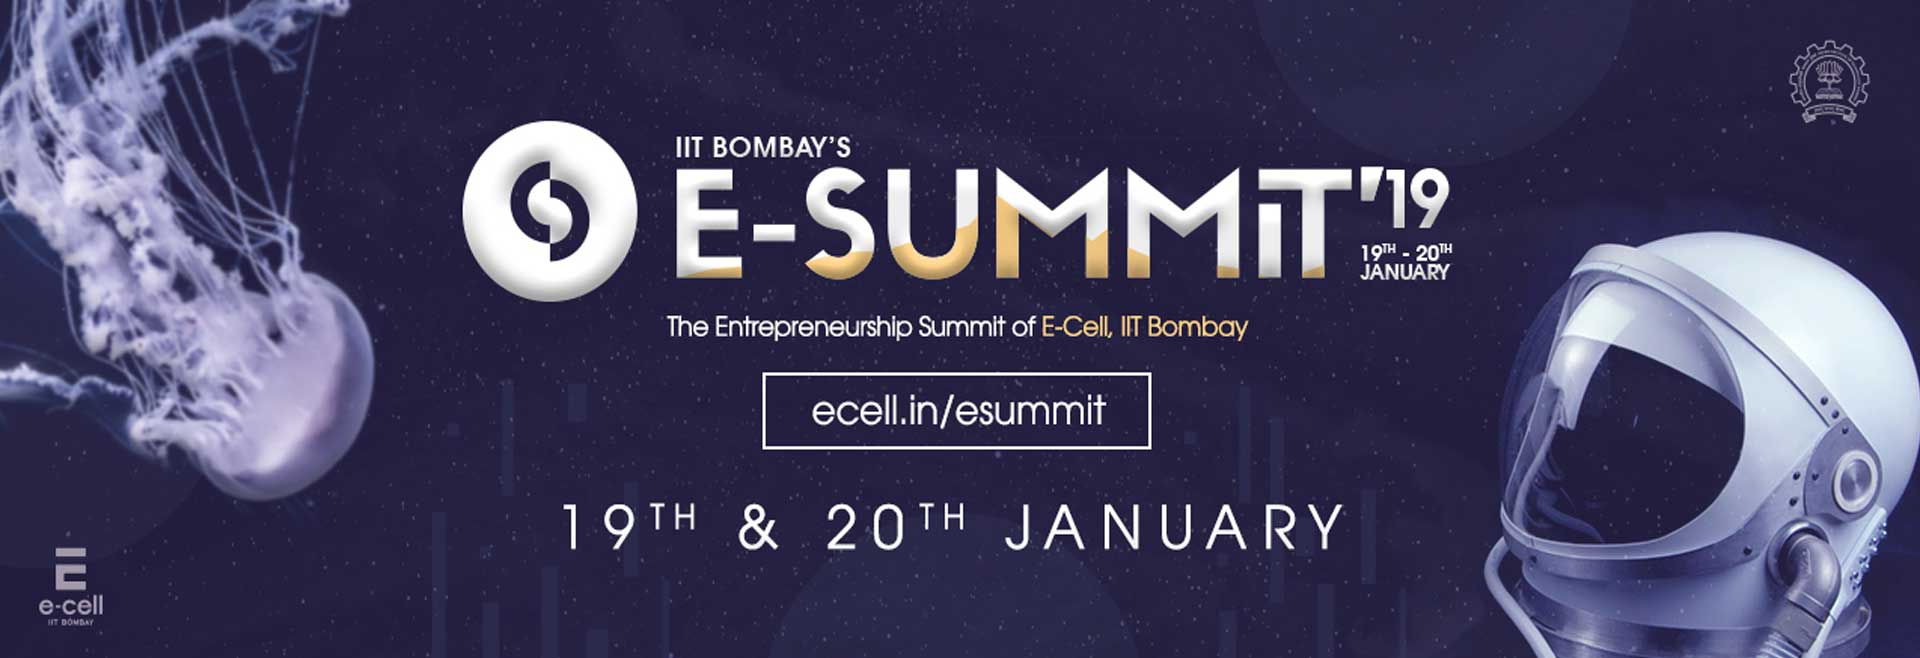 Annual Entrepreneurship Summit 2019